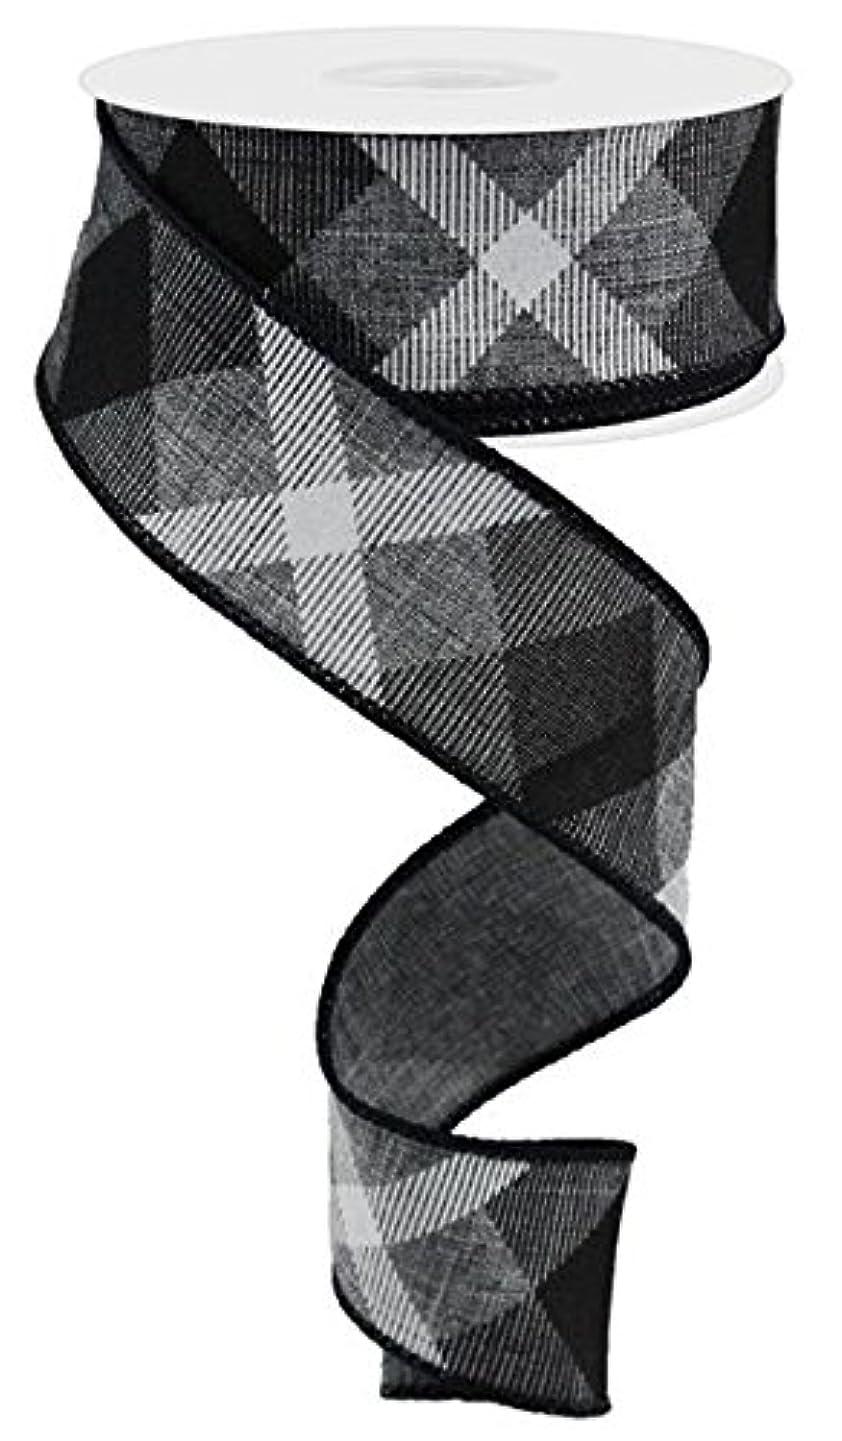 Plaid Canvas Wired Edge Ribbon, 10 Yards (Grey, Black, White, 1.5